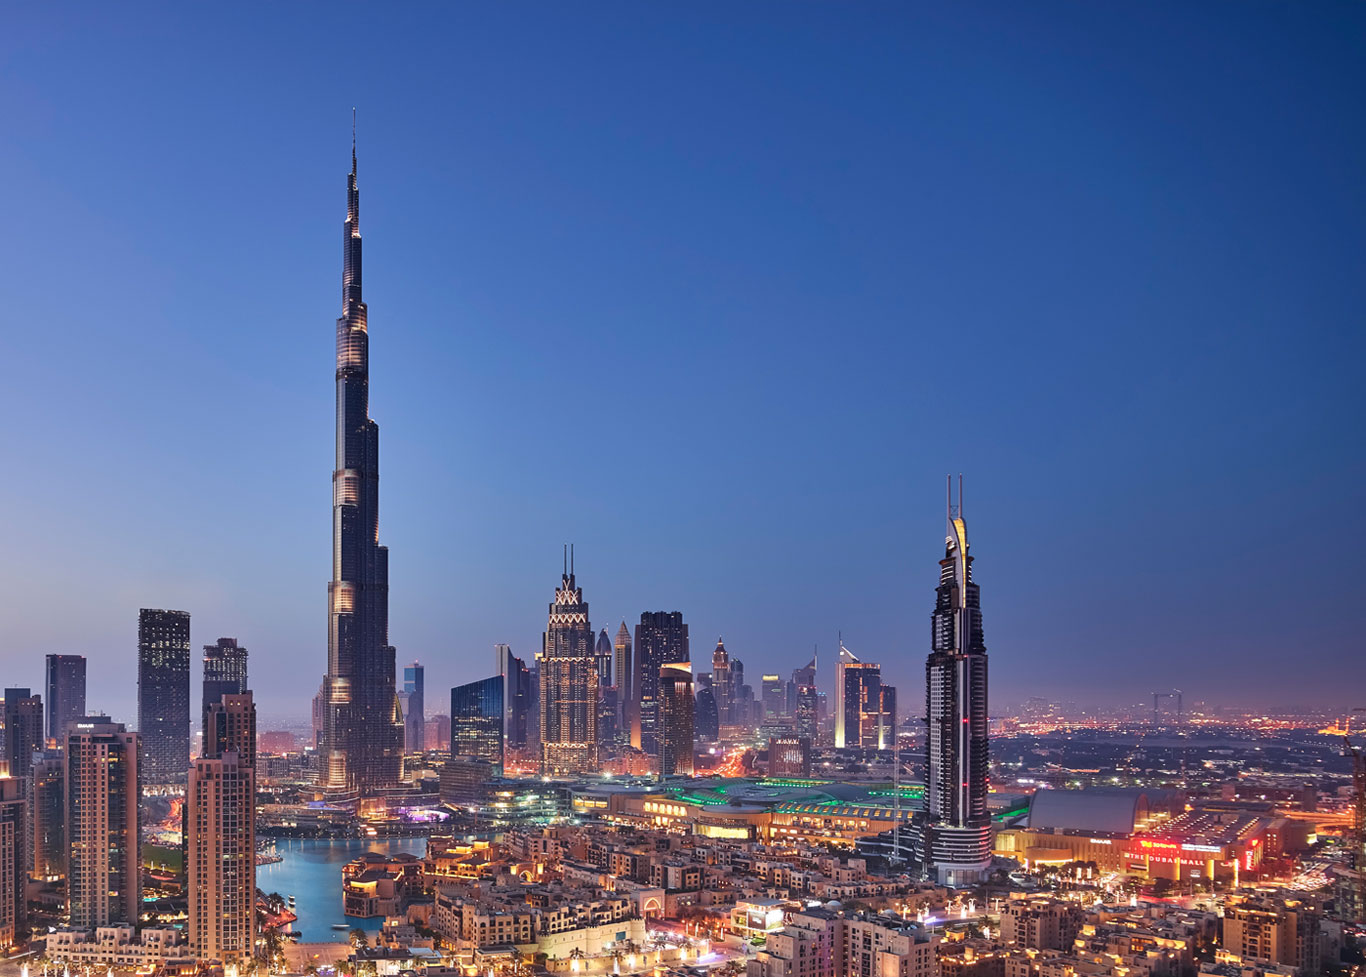 Where is Burj Khalifa located